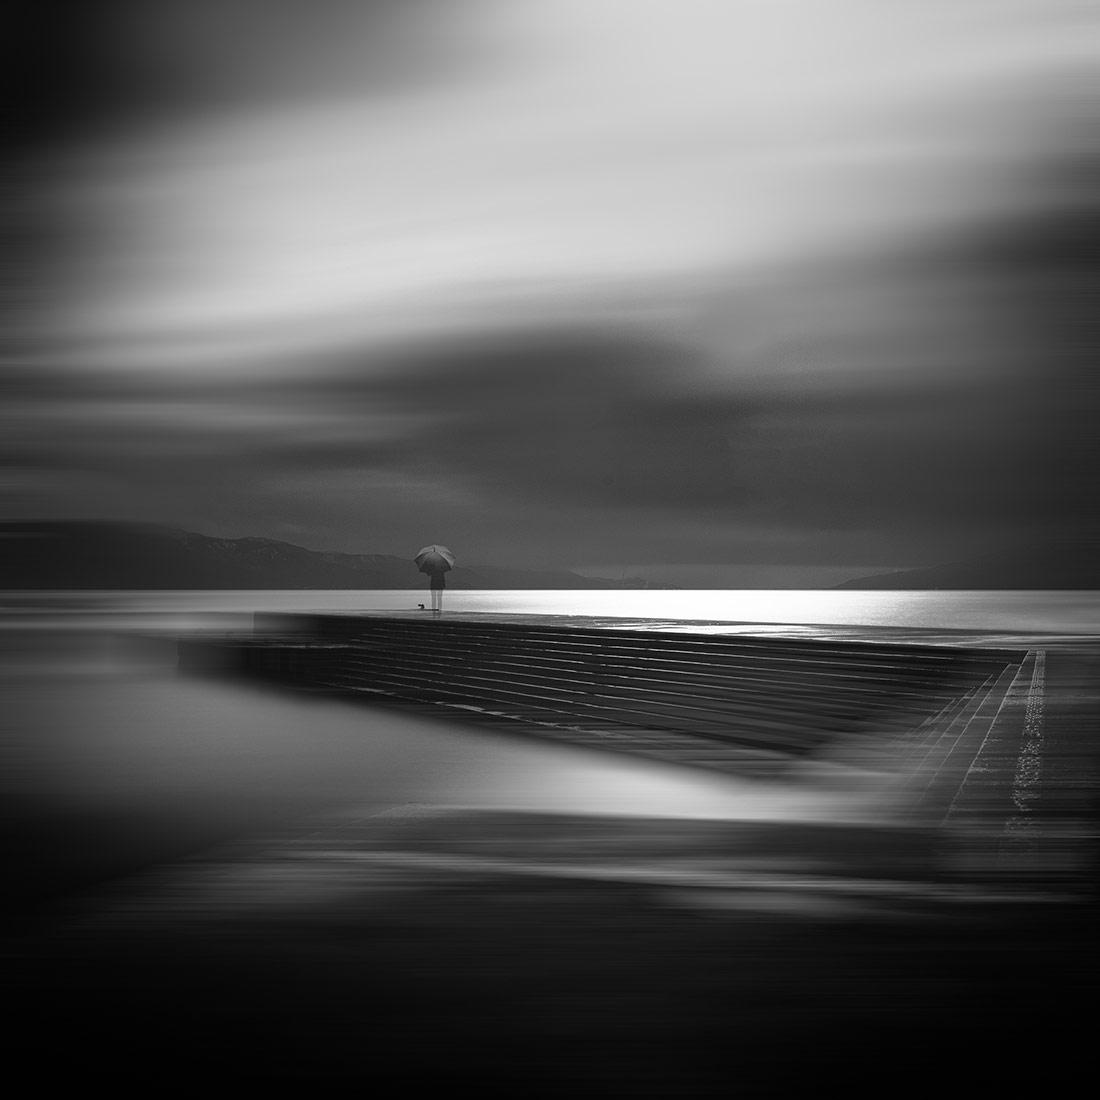 Memory, © Seong Joe Woo, 1st Place - Black & White Fine Art Photo of the Year 2018, MonoVisions Photography Awards